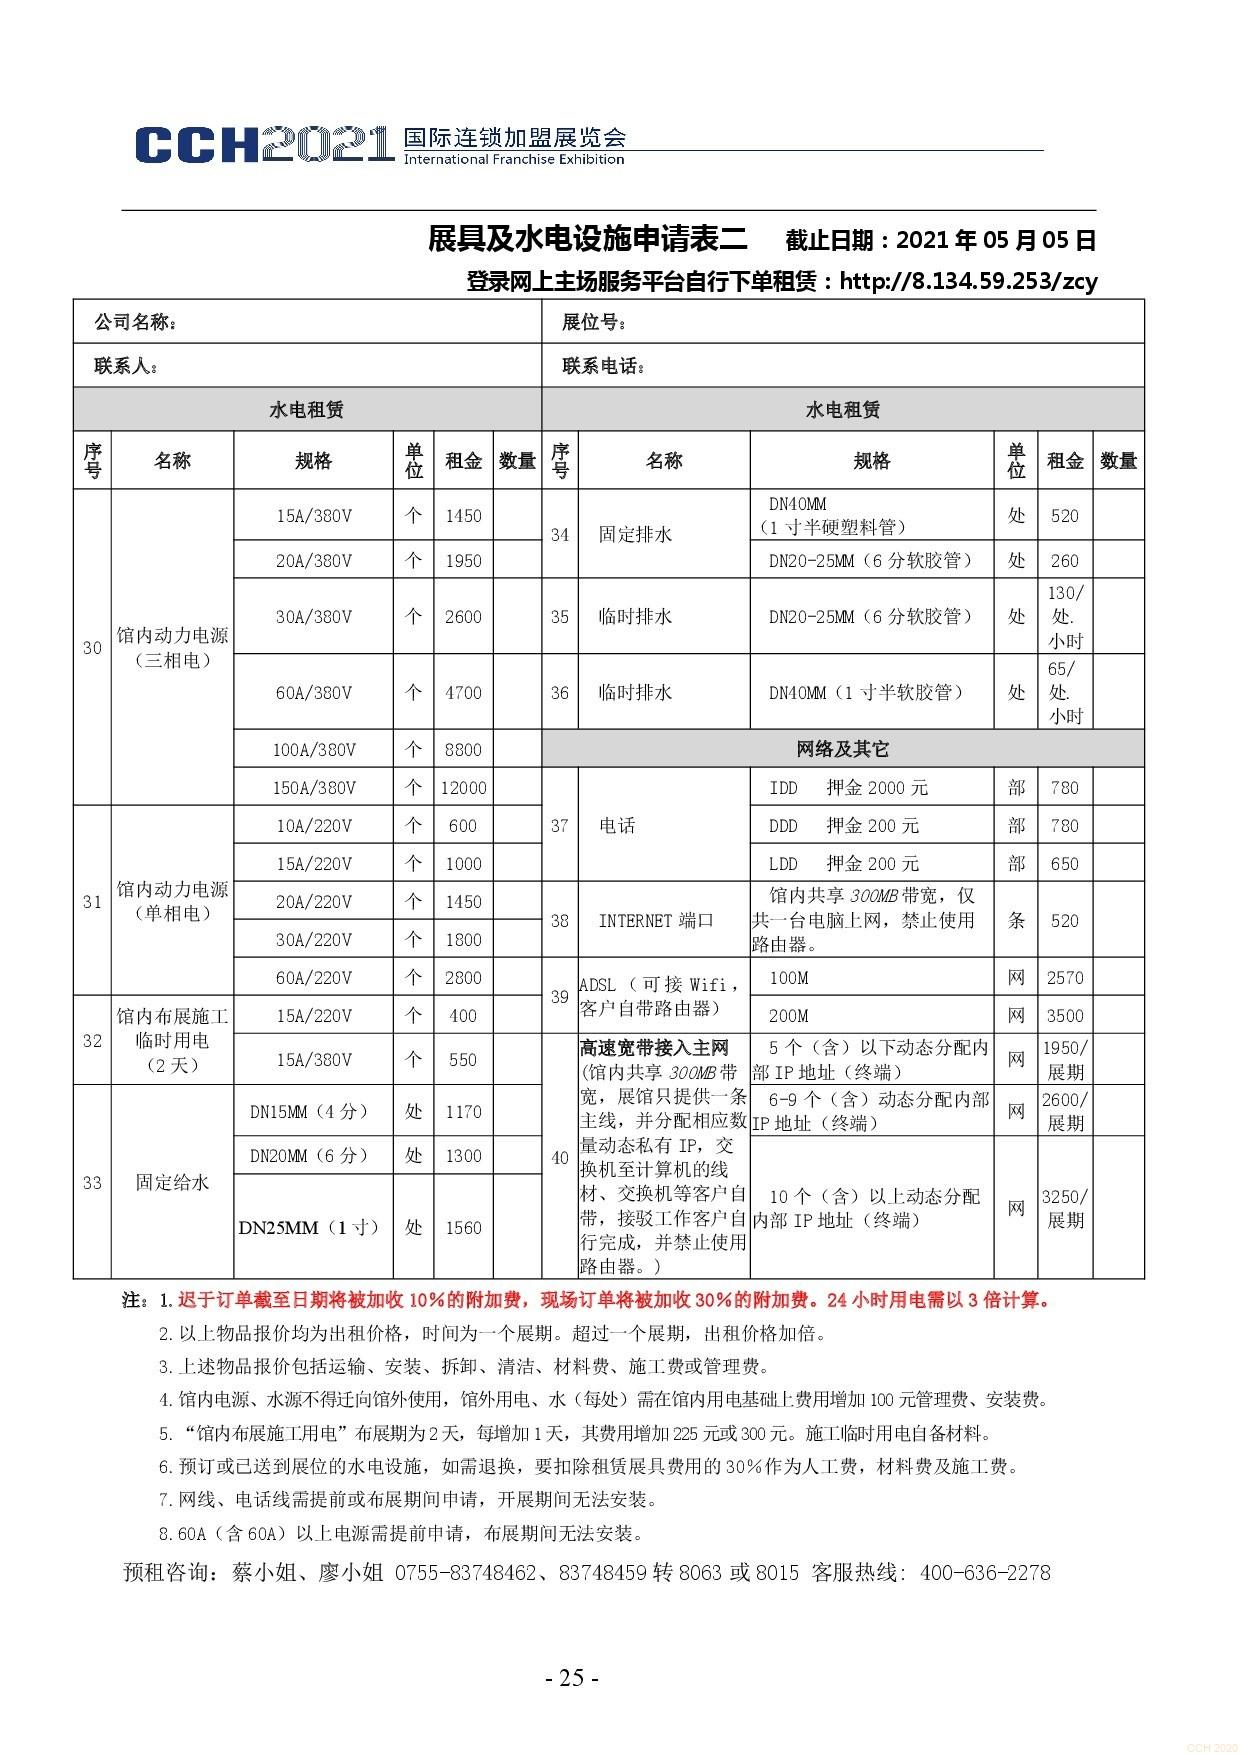 0416CCH深圳展参展商手册4.16-025.jpg